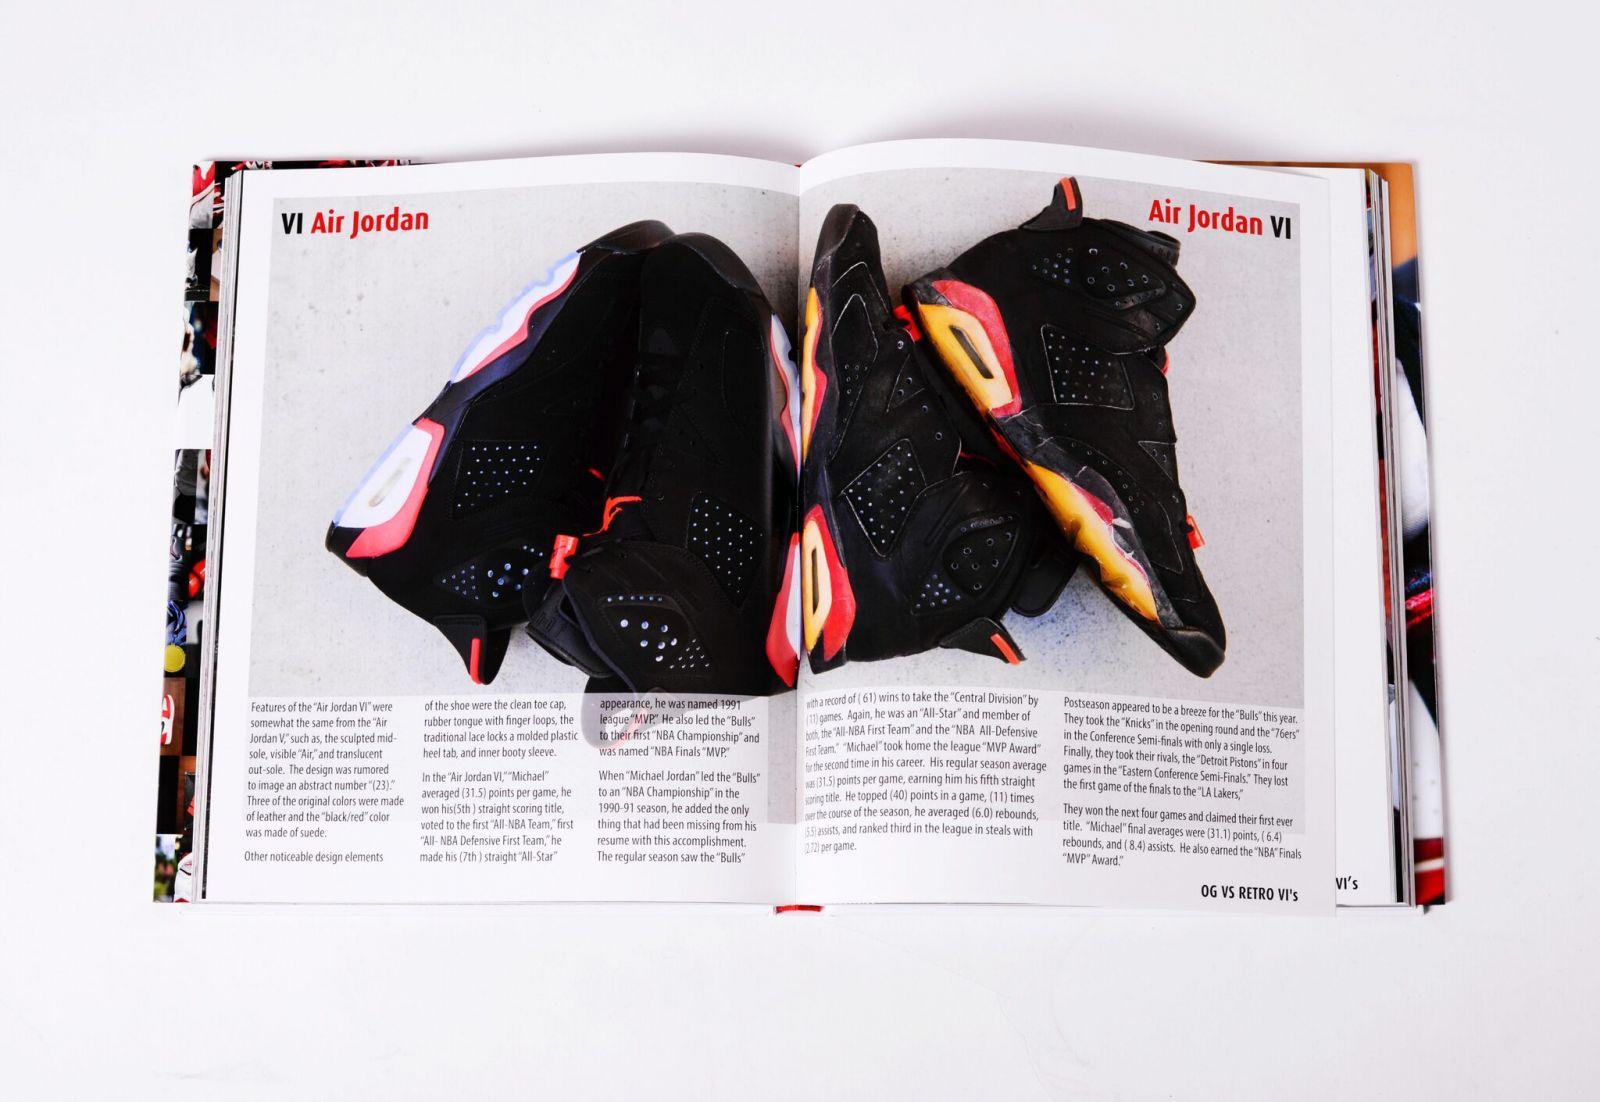 6e83d3fe34648 It's Your Last Shot to Own the Encyclopedia of Air Jordans | Sole ...